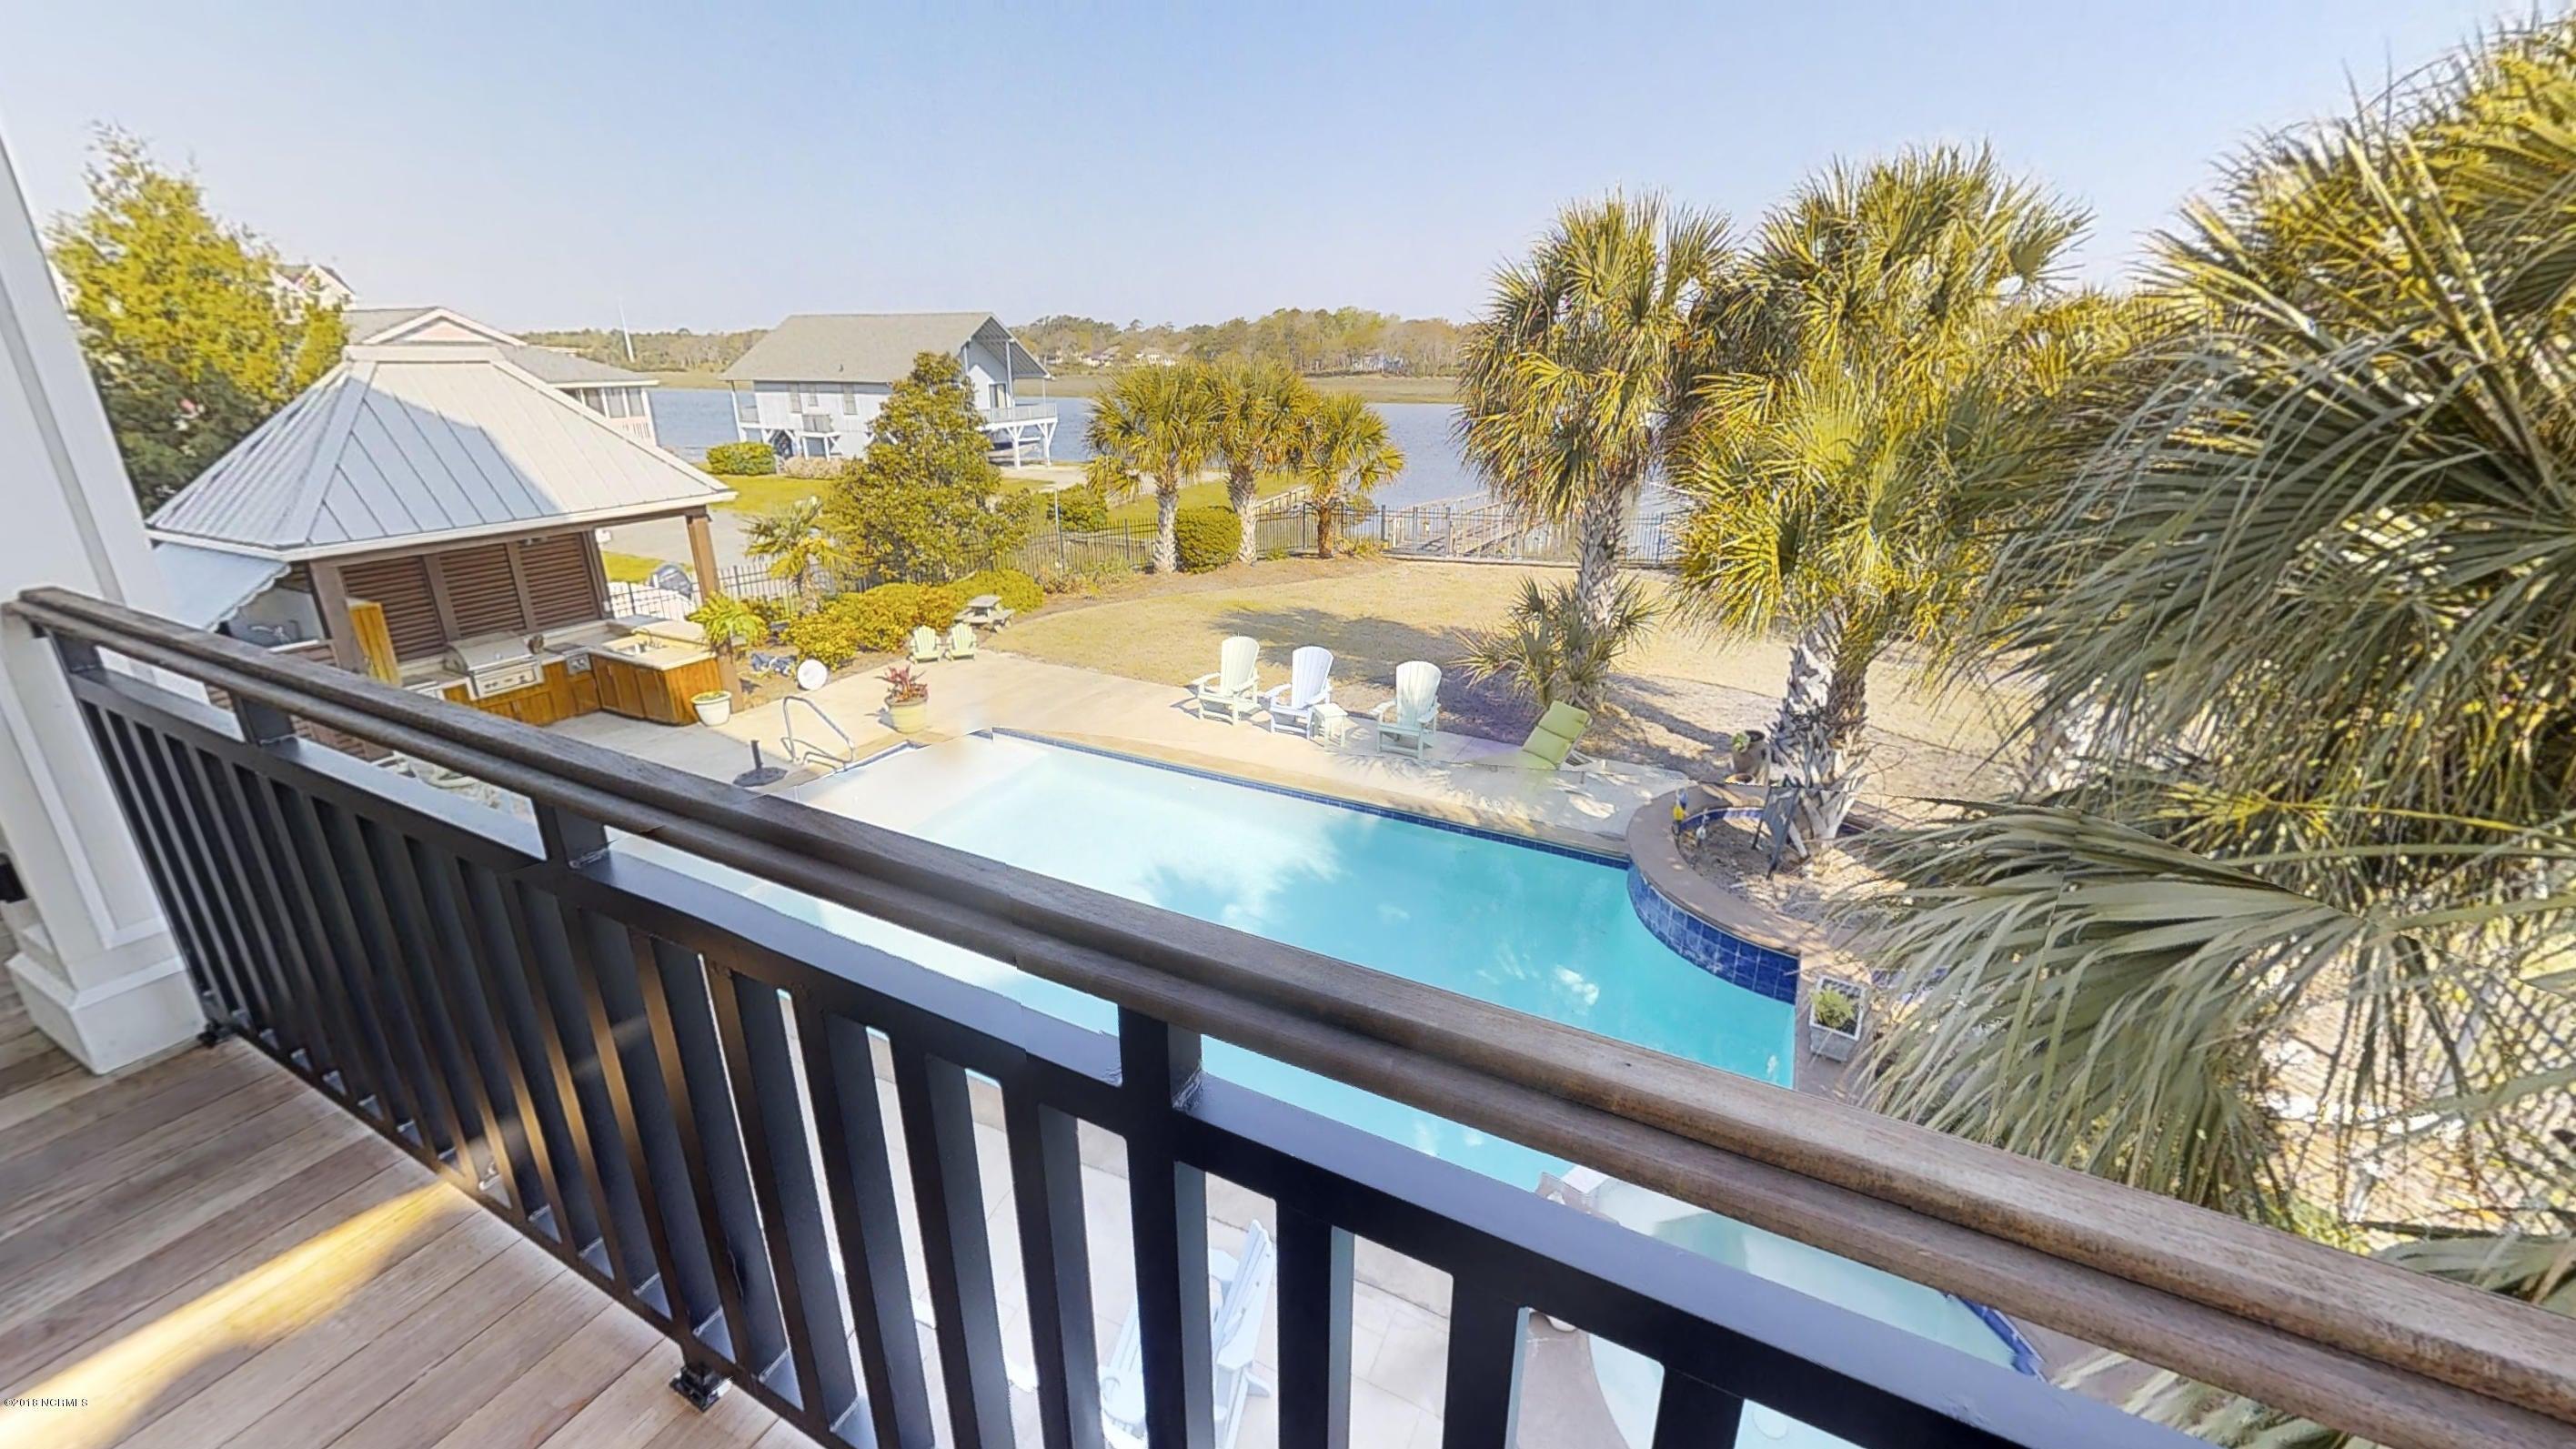 Ocean Isle Beach Real Estate - http://cdn.resize.sparkplatform.com/ncr/1024x768/true/20180414120351825354000000-o.jpg